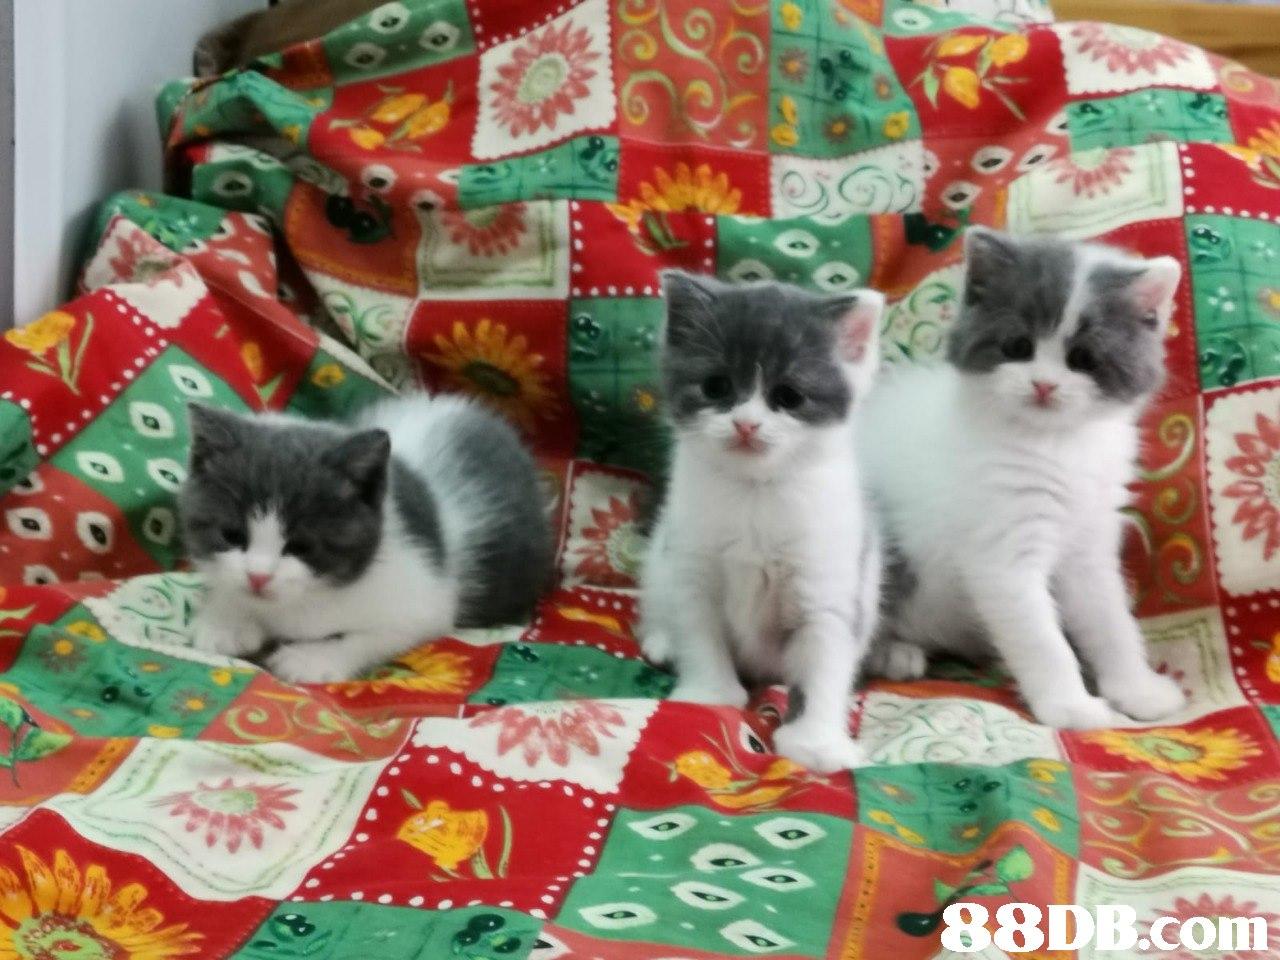 88D B.com  Cat,Mammal,Small to medium-sized cats,Felidae,Kitten